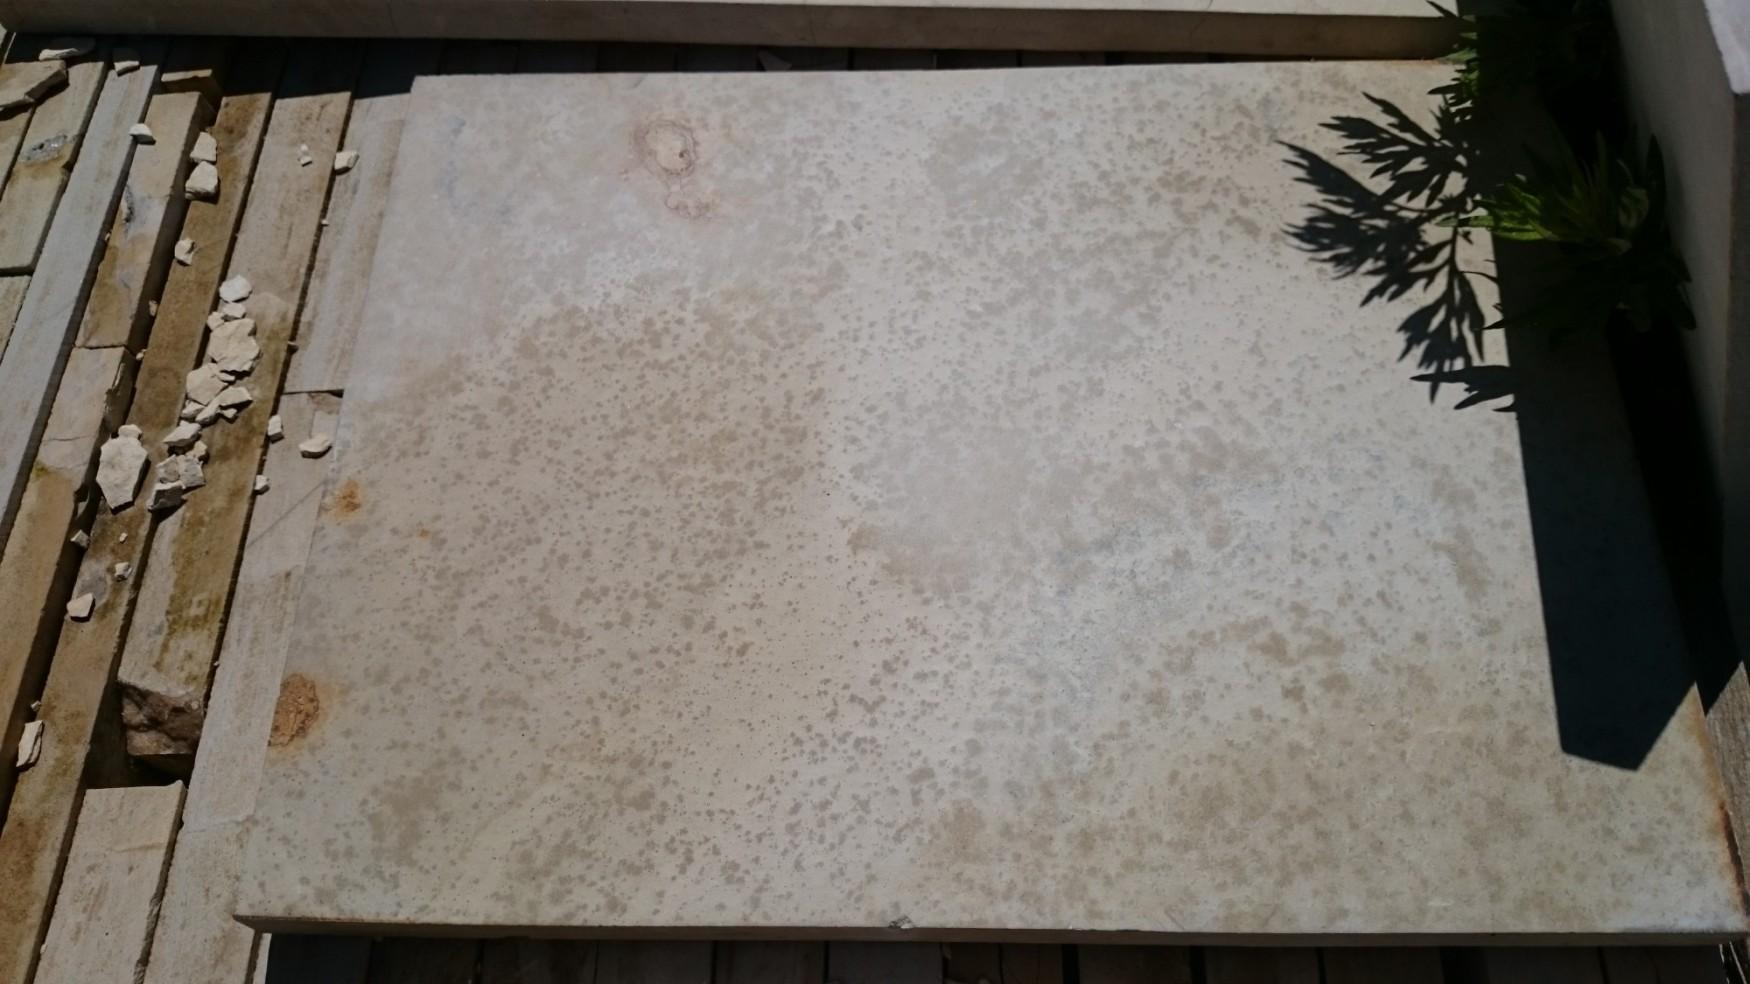 Плита антика 400*400*30 - плитка из природного камня для улицы